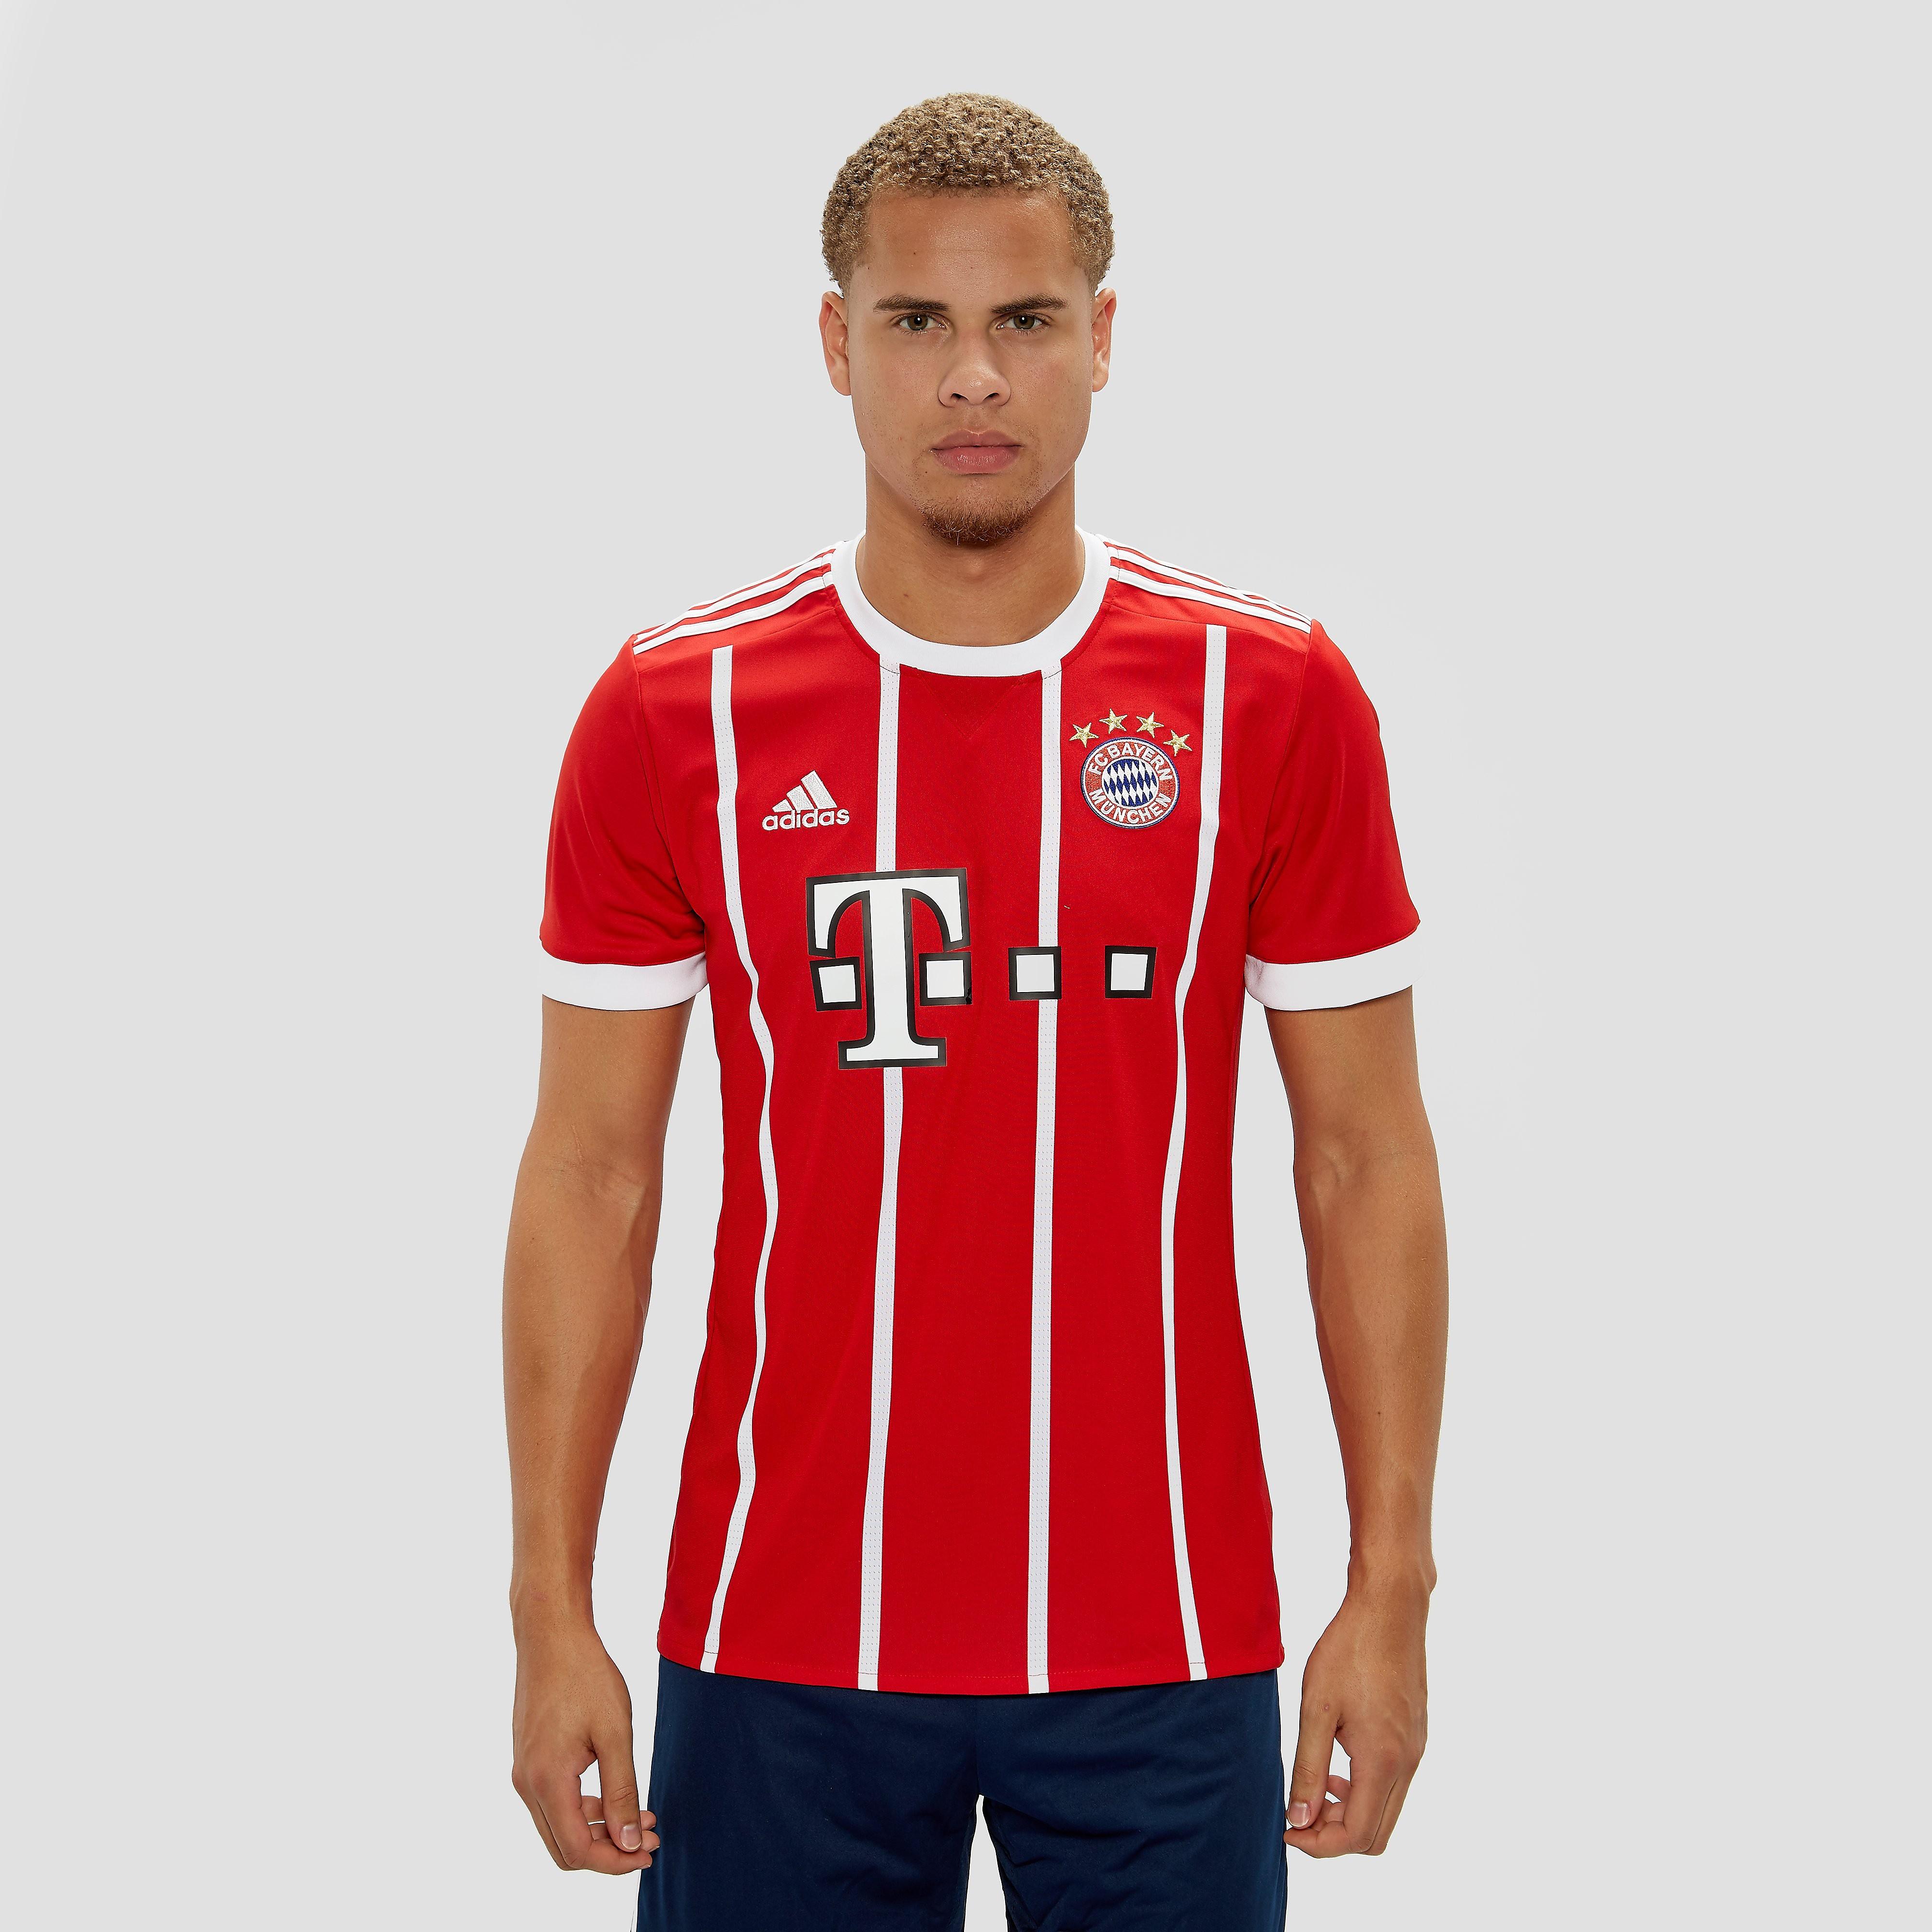 ADIDAS FC BAYERN MÜNCHEN THUISSHIRT HEREN